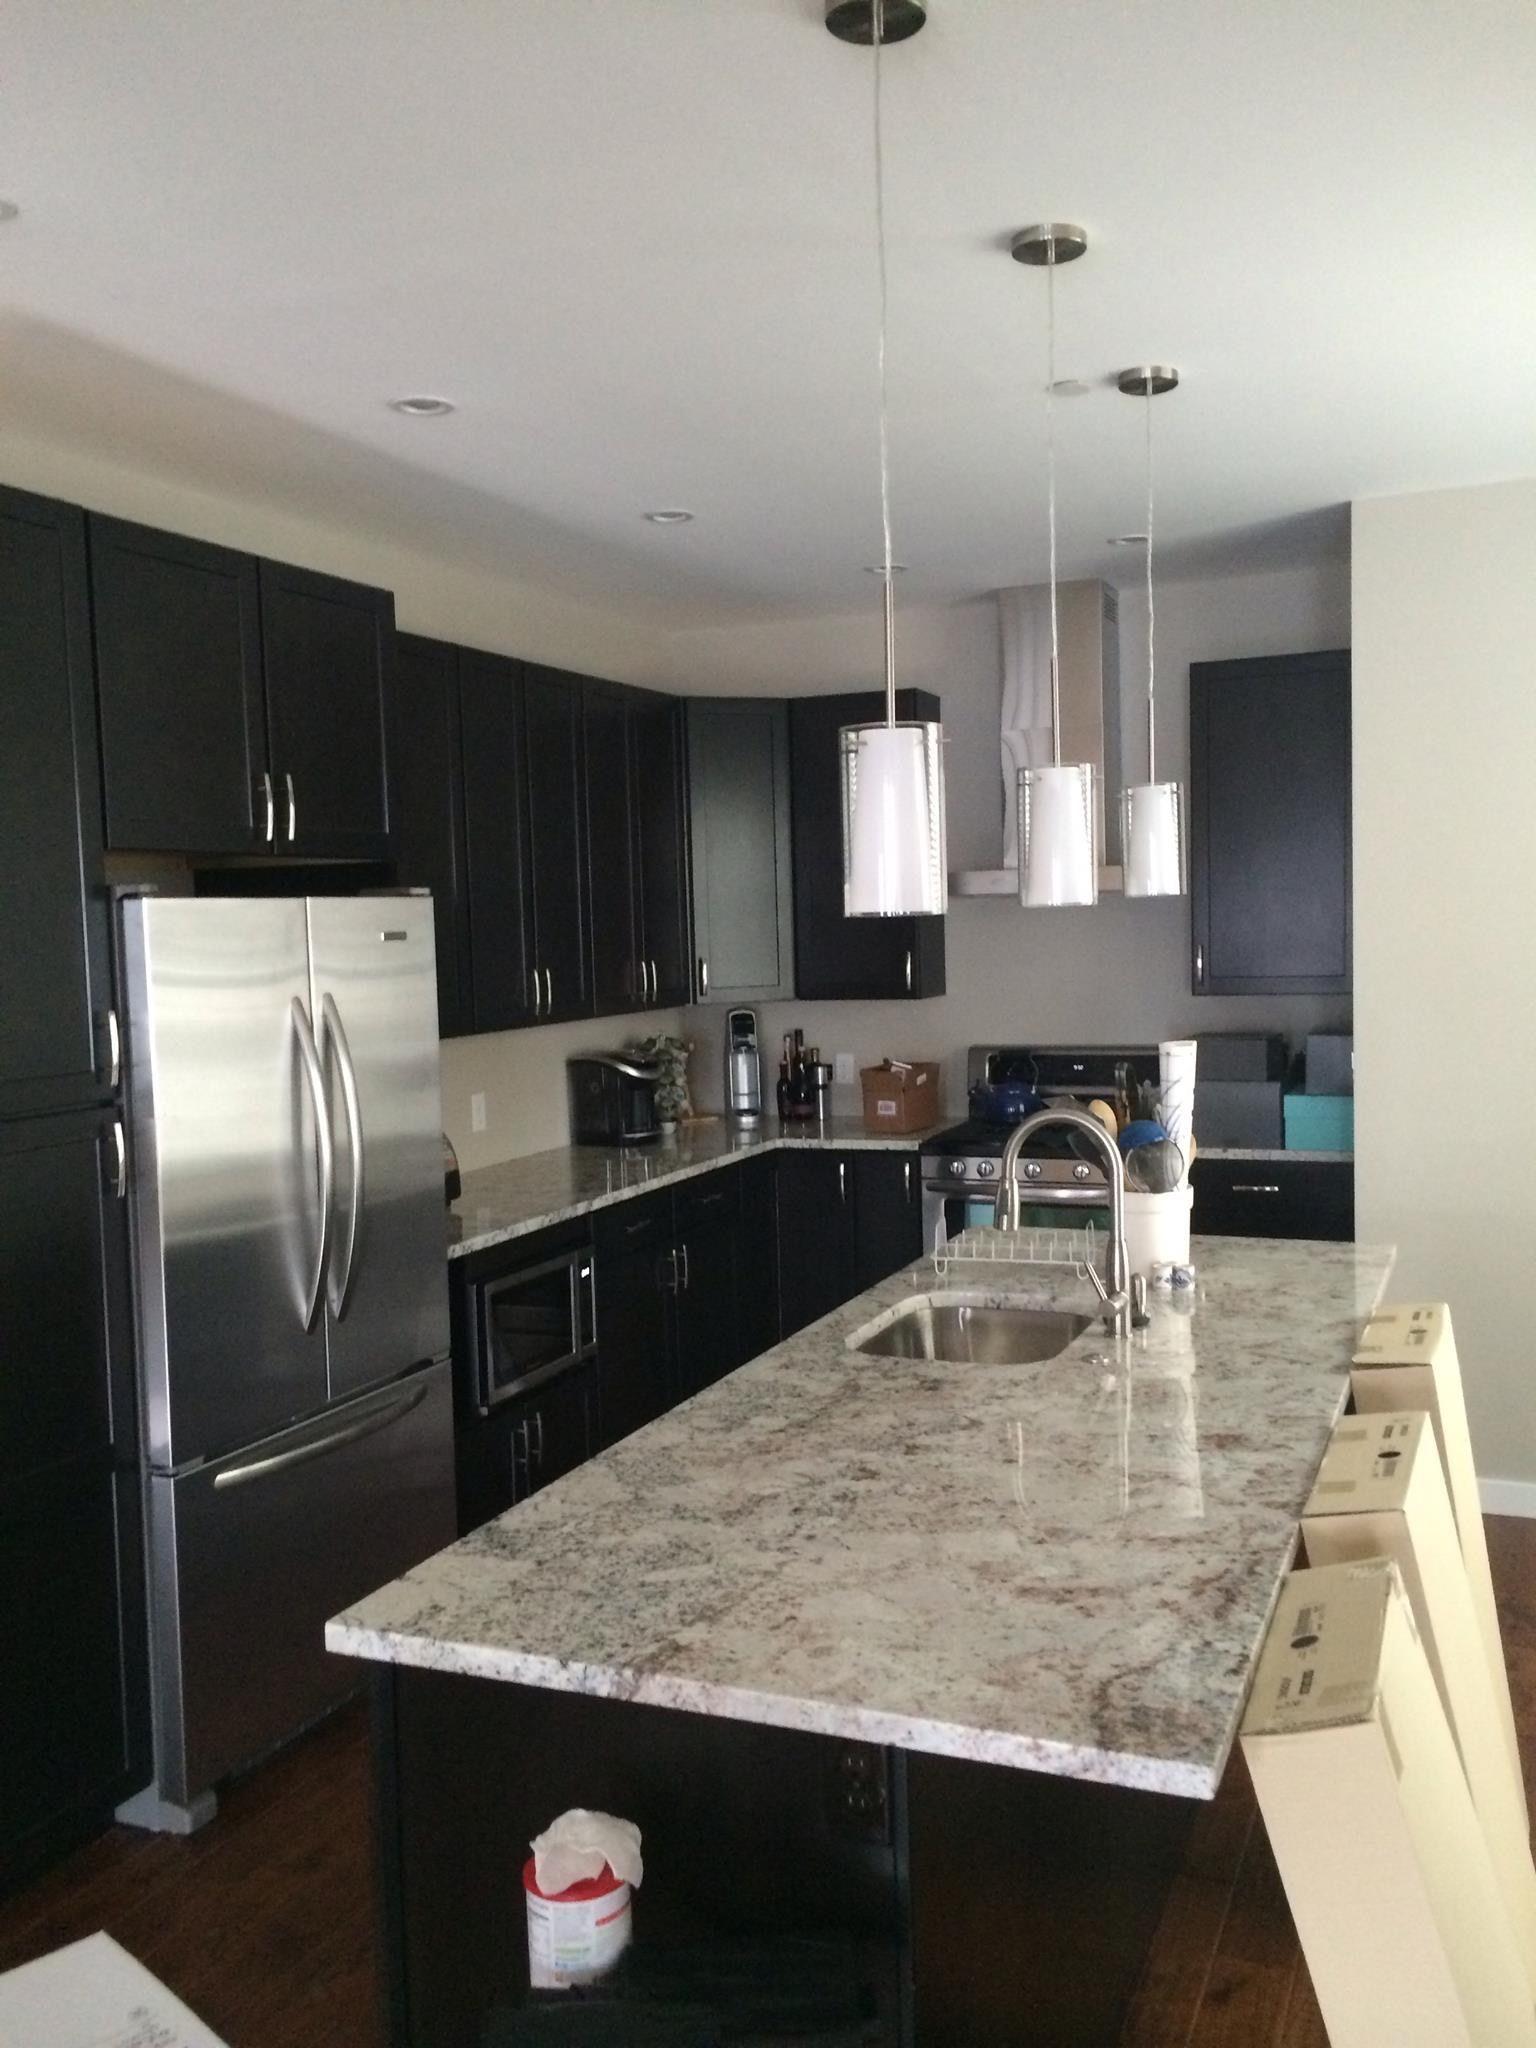 White Galaxy Granite Kitchen White Galaxy Granite Kitchen Countertop With Eased Edge Detail